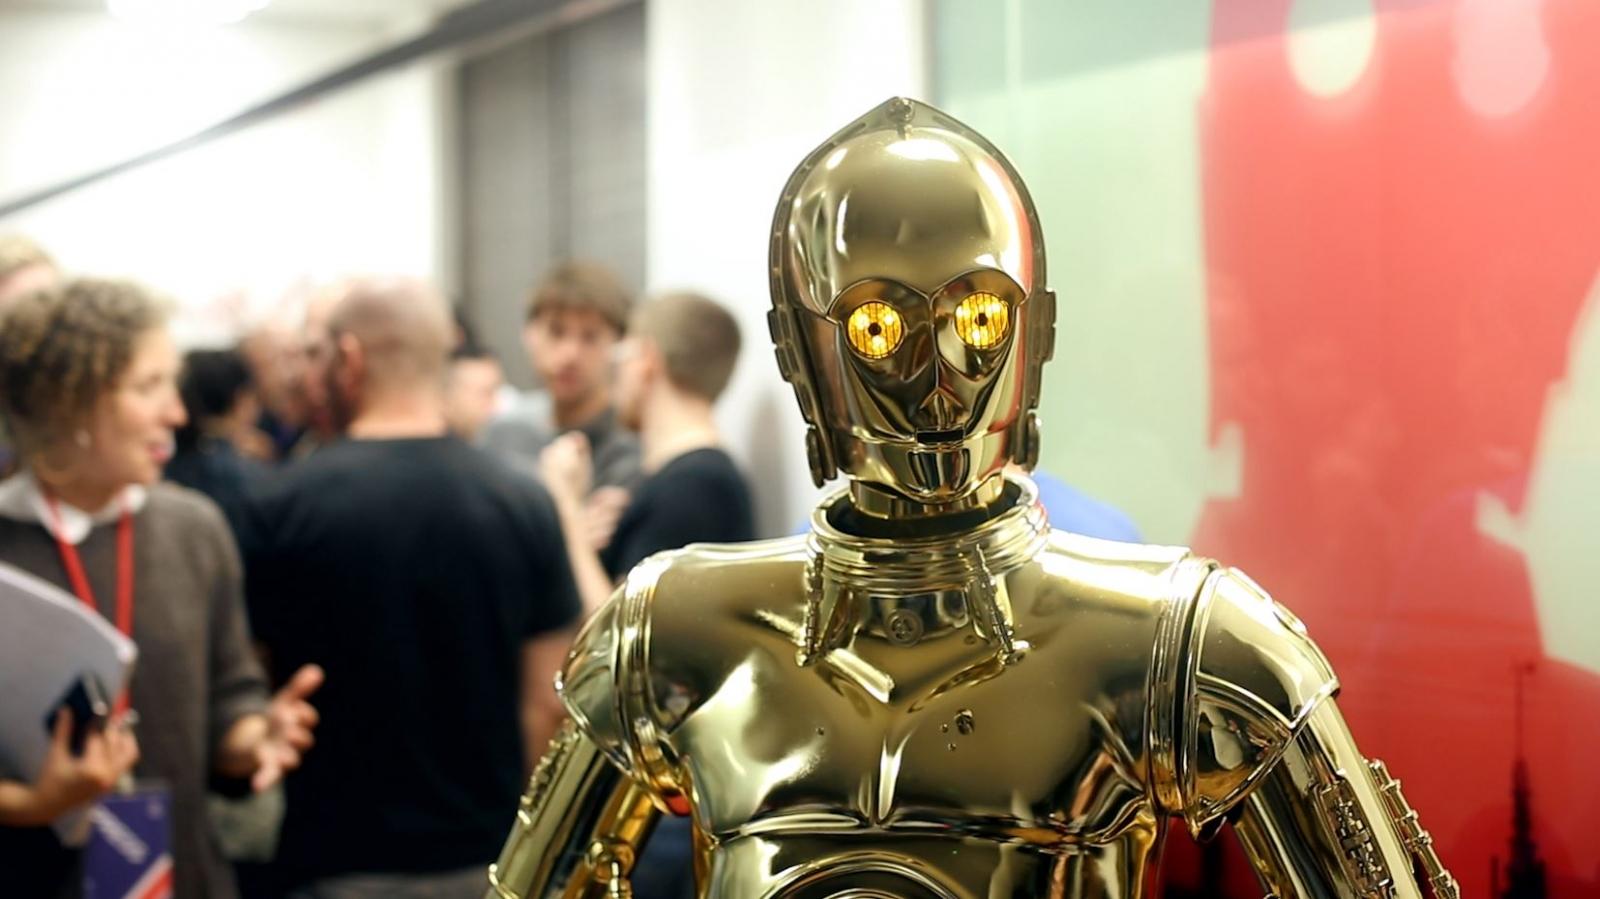 ILM London on Bringing New Star Wars Films to the Big Screen